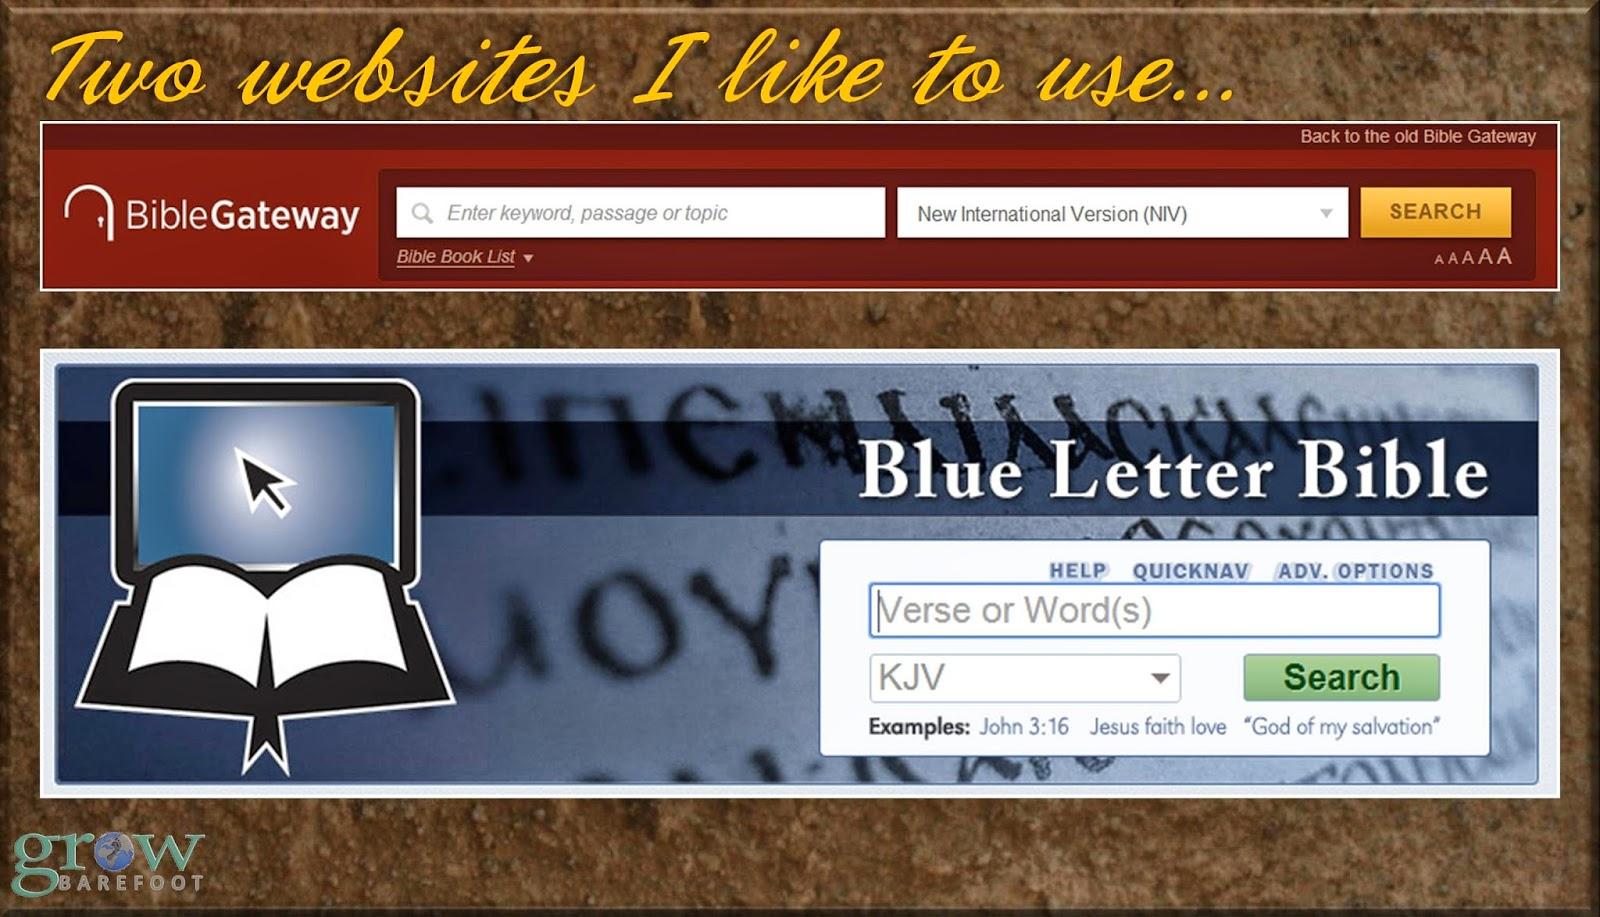 blue letter bible devotionals grow barefoot june 2014